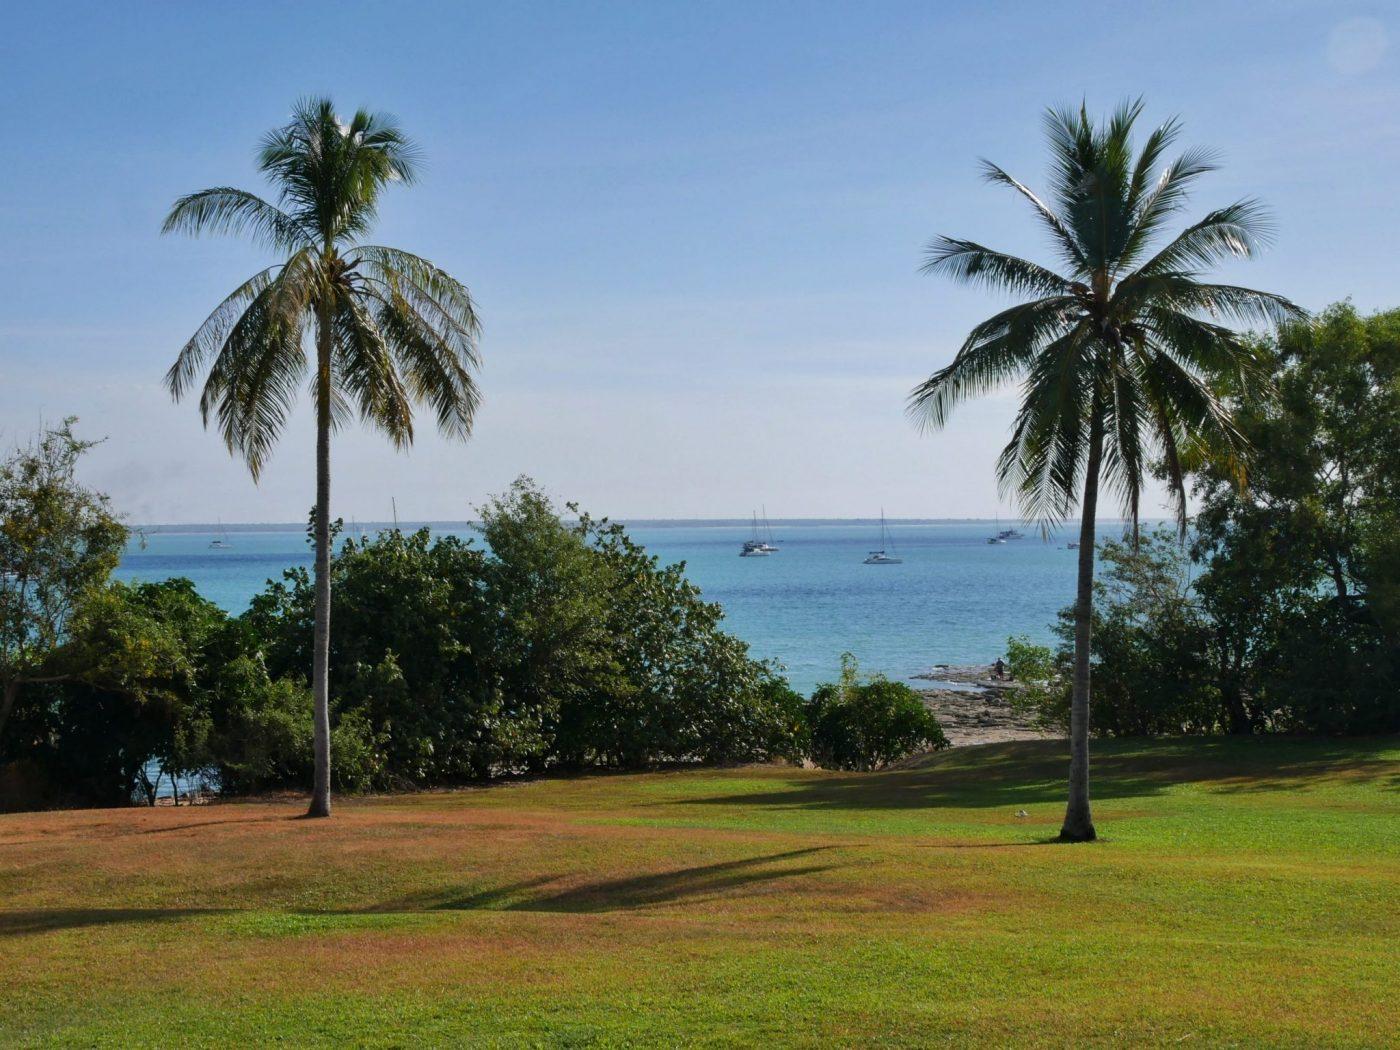 Palm trees and sailboats at Fannie Bay in Darwin